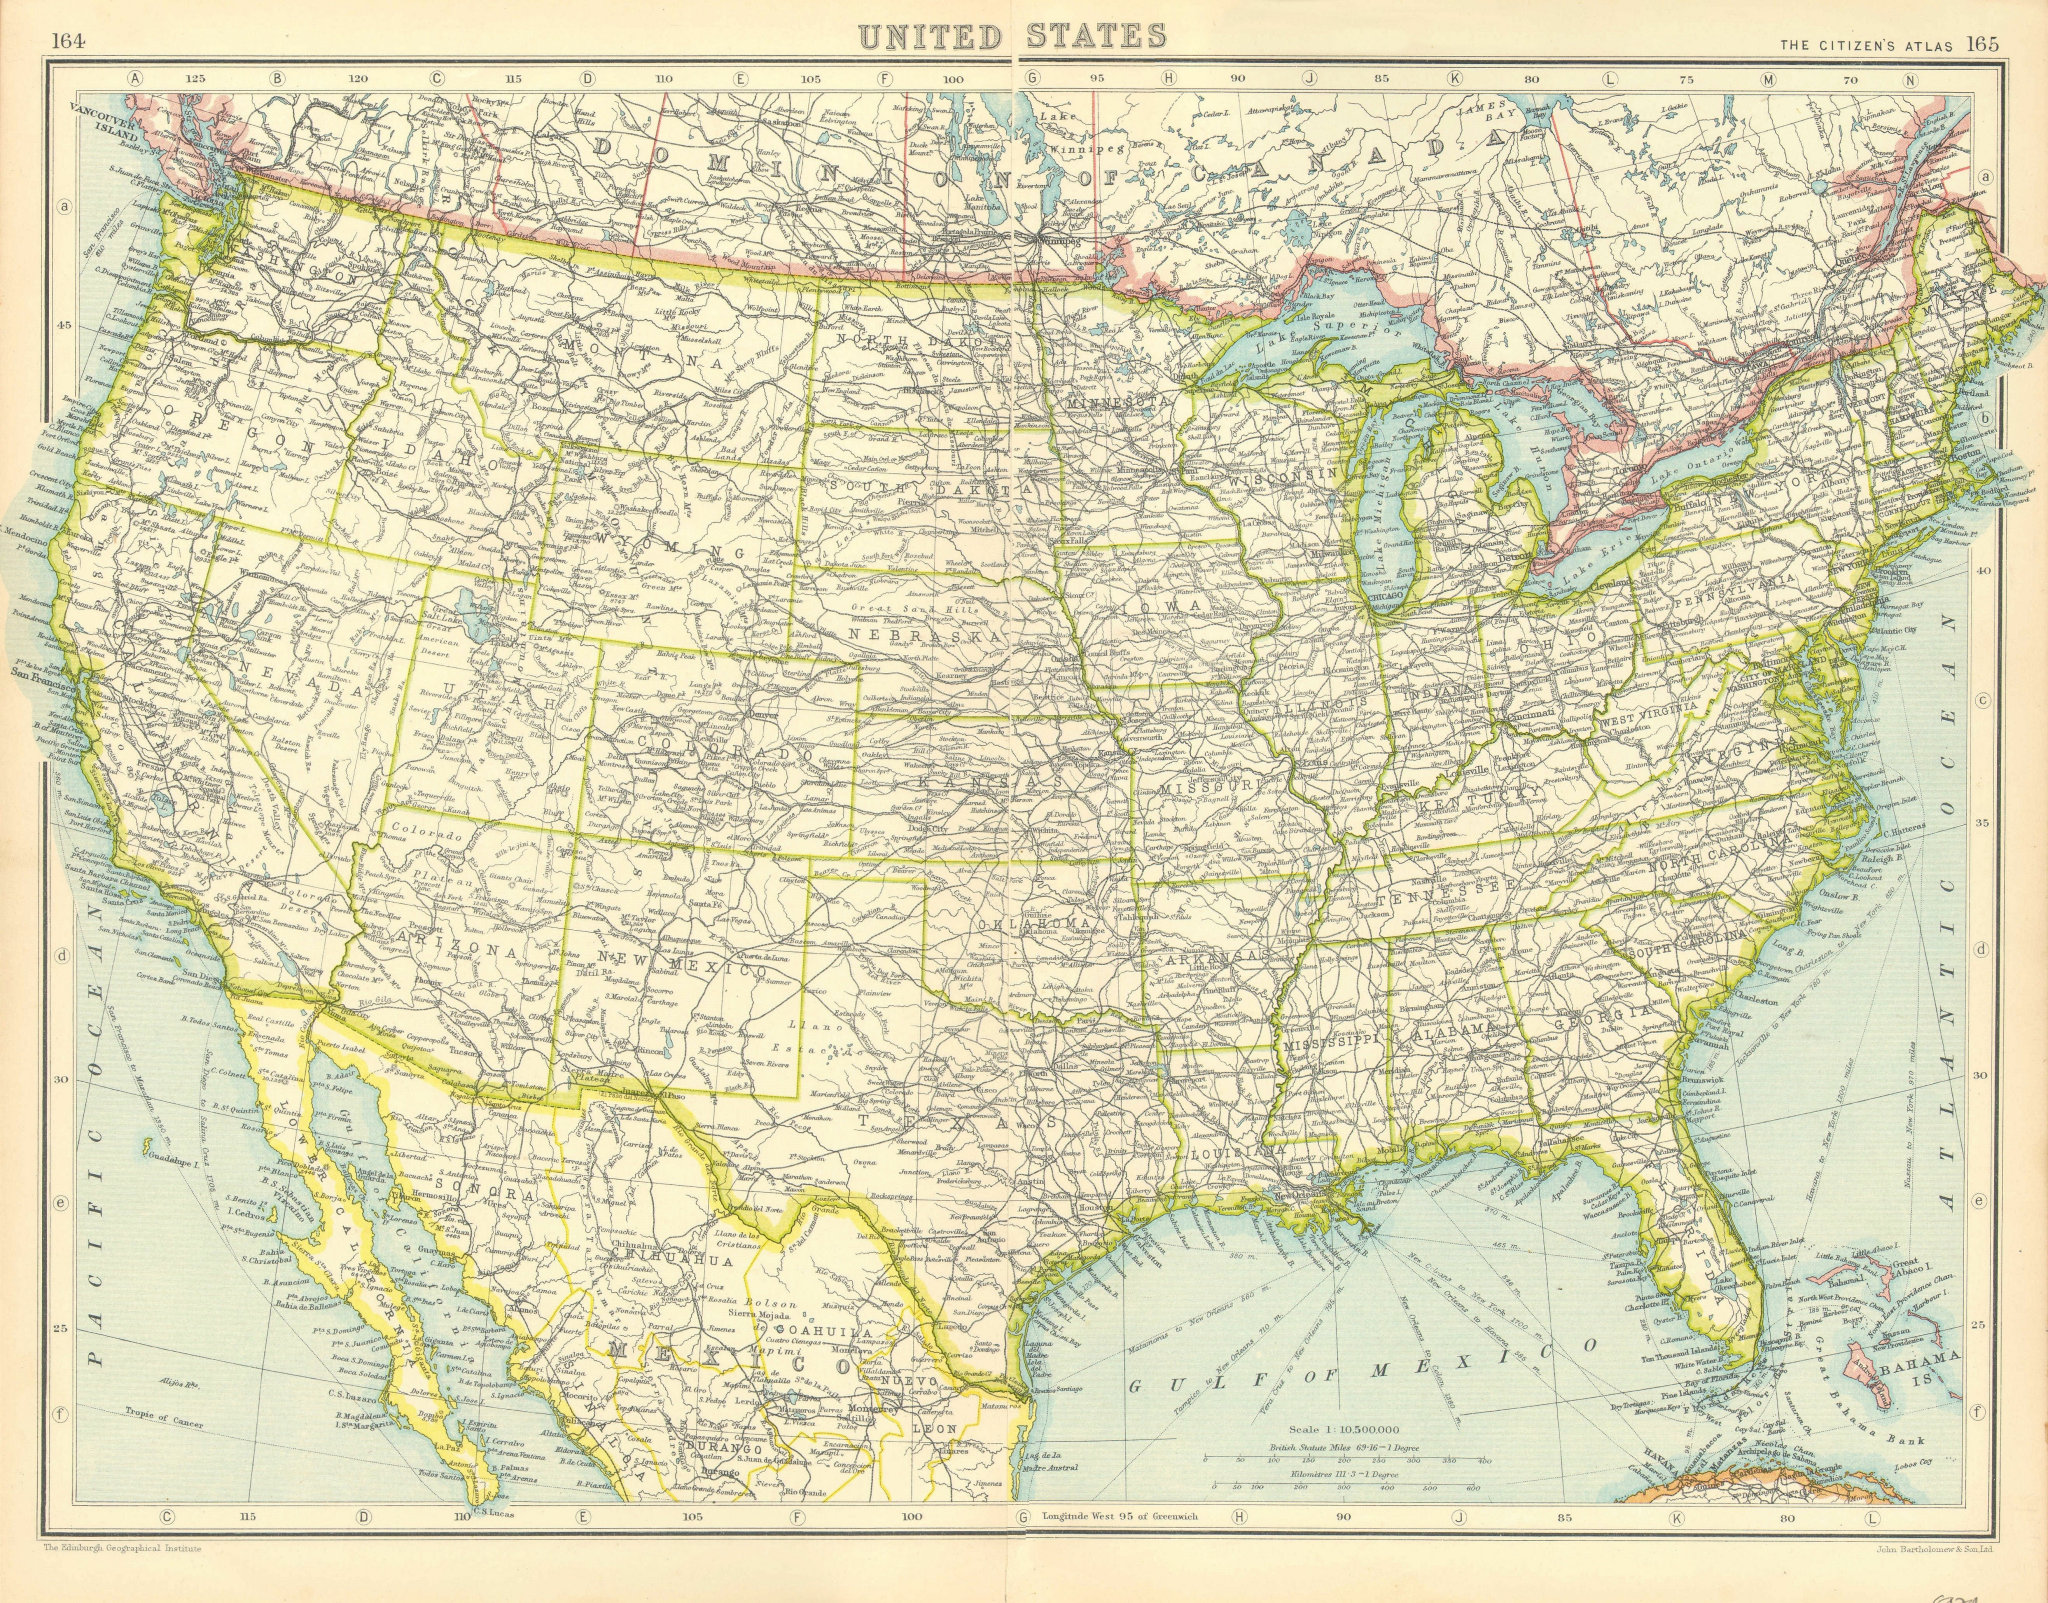 Associate Product USA. United States general map. BARTHOLOMEW 1924 old vintage plan chart